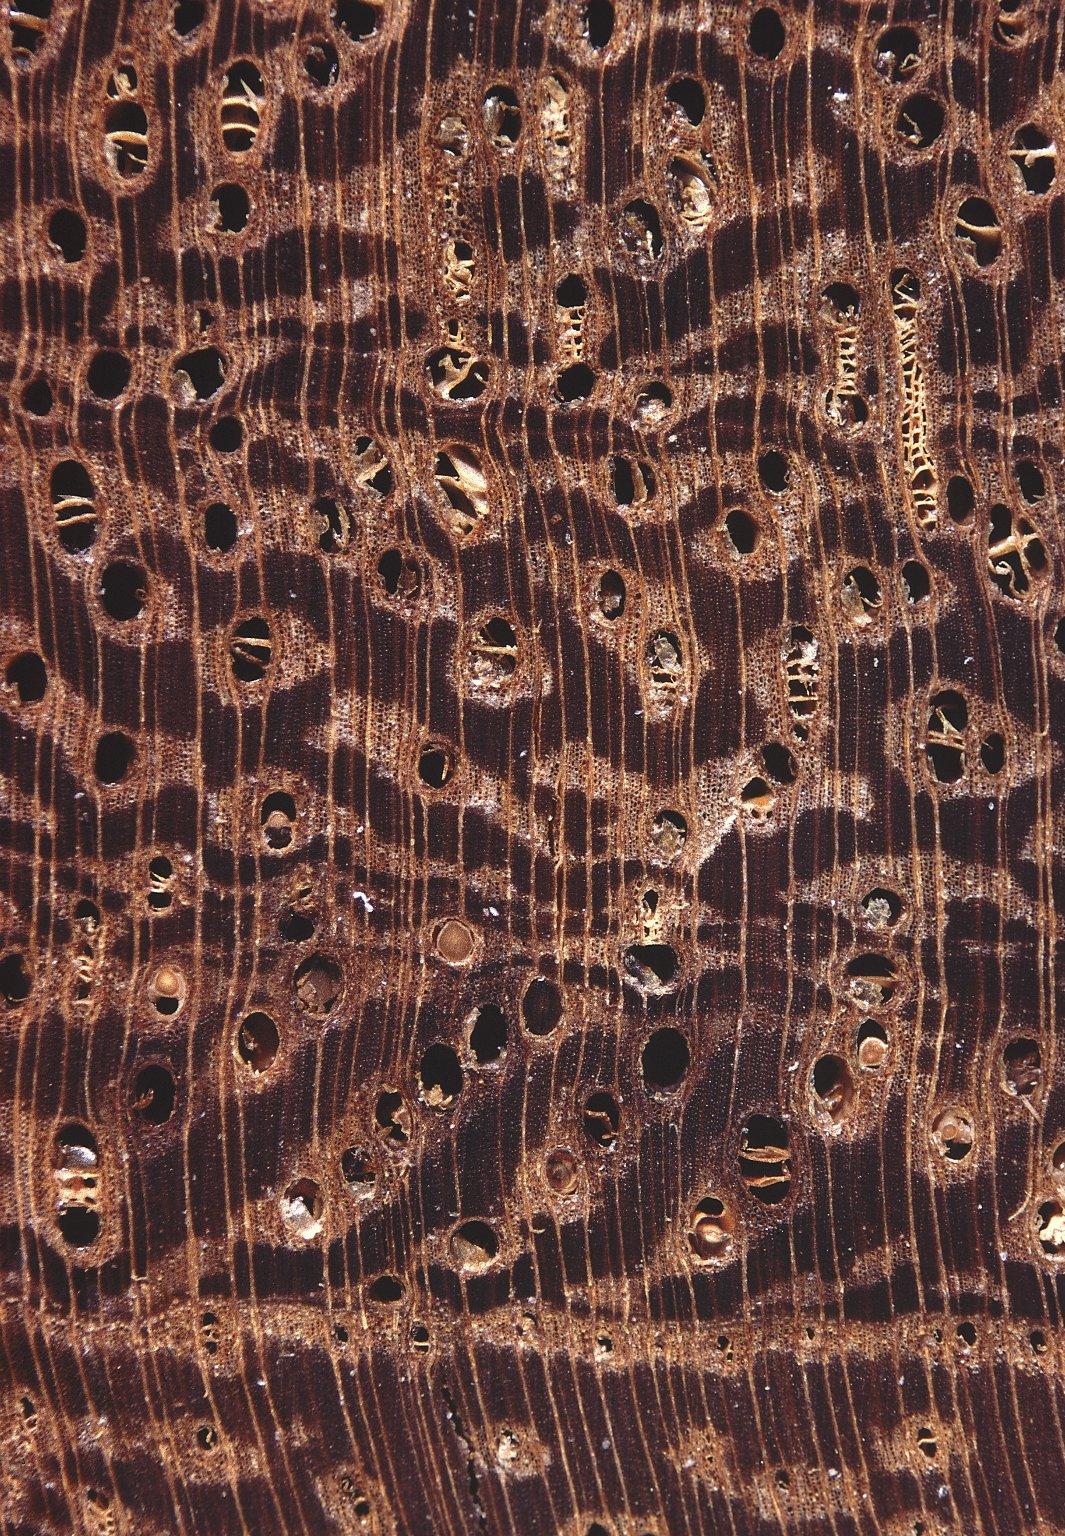 LEGUMINOSAE CAESALPINIOIDEAE Mimosoid Clade Inga leiocalycina